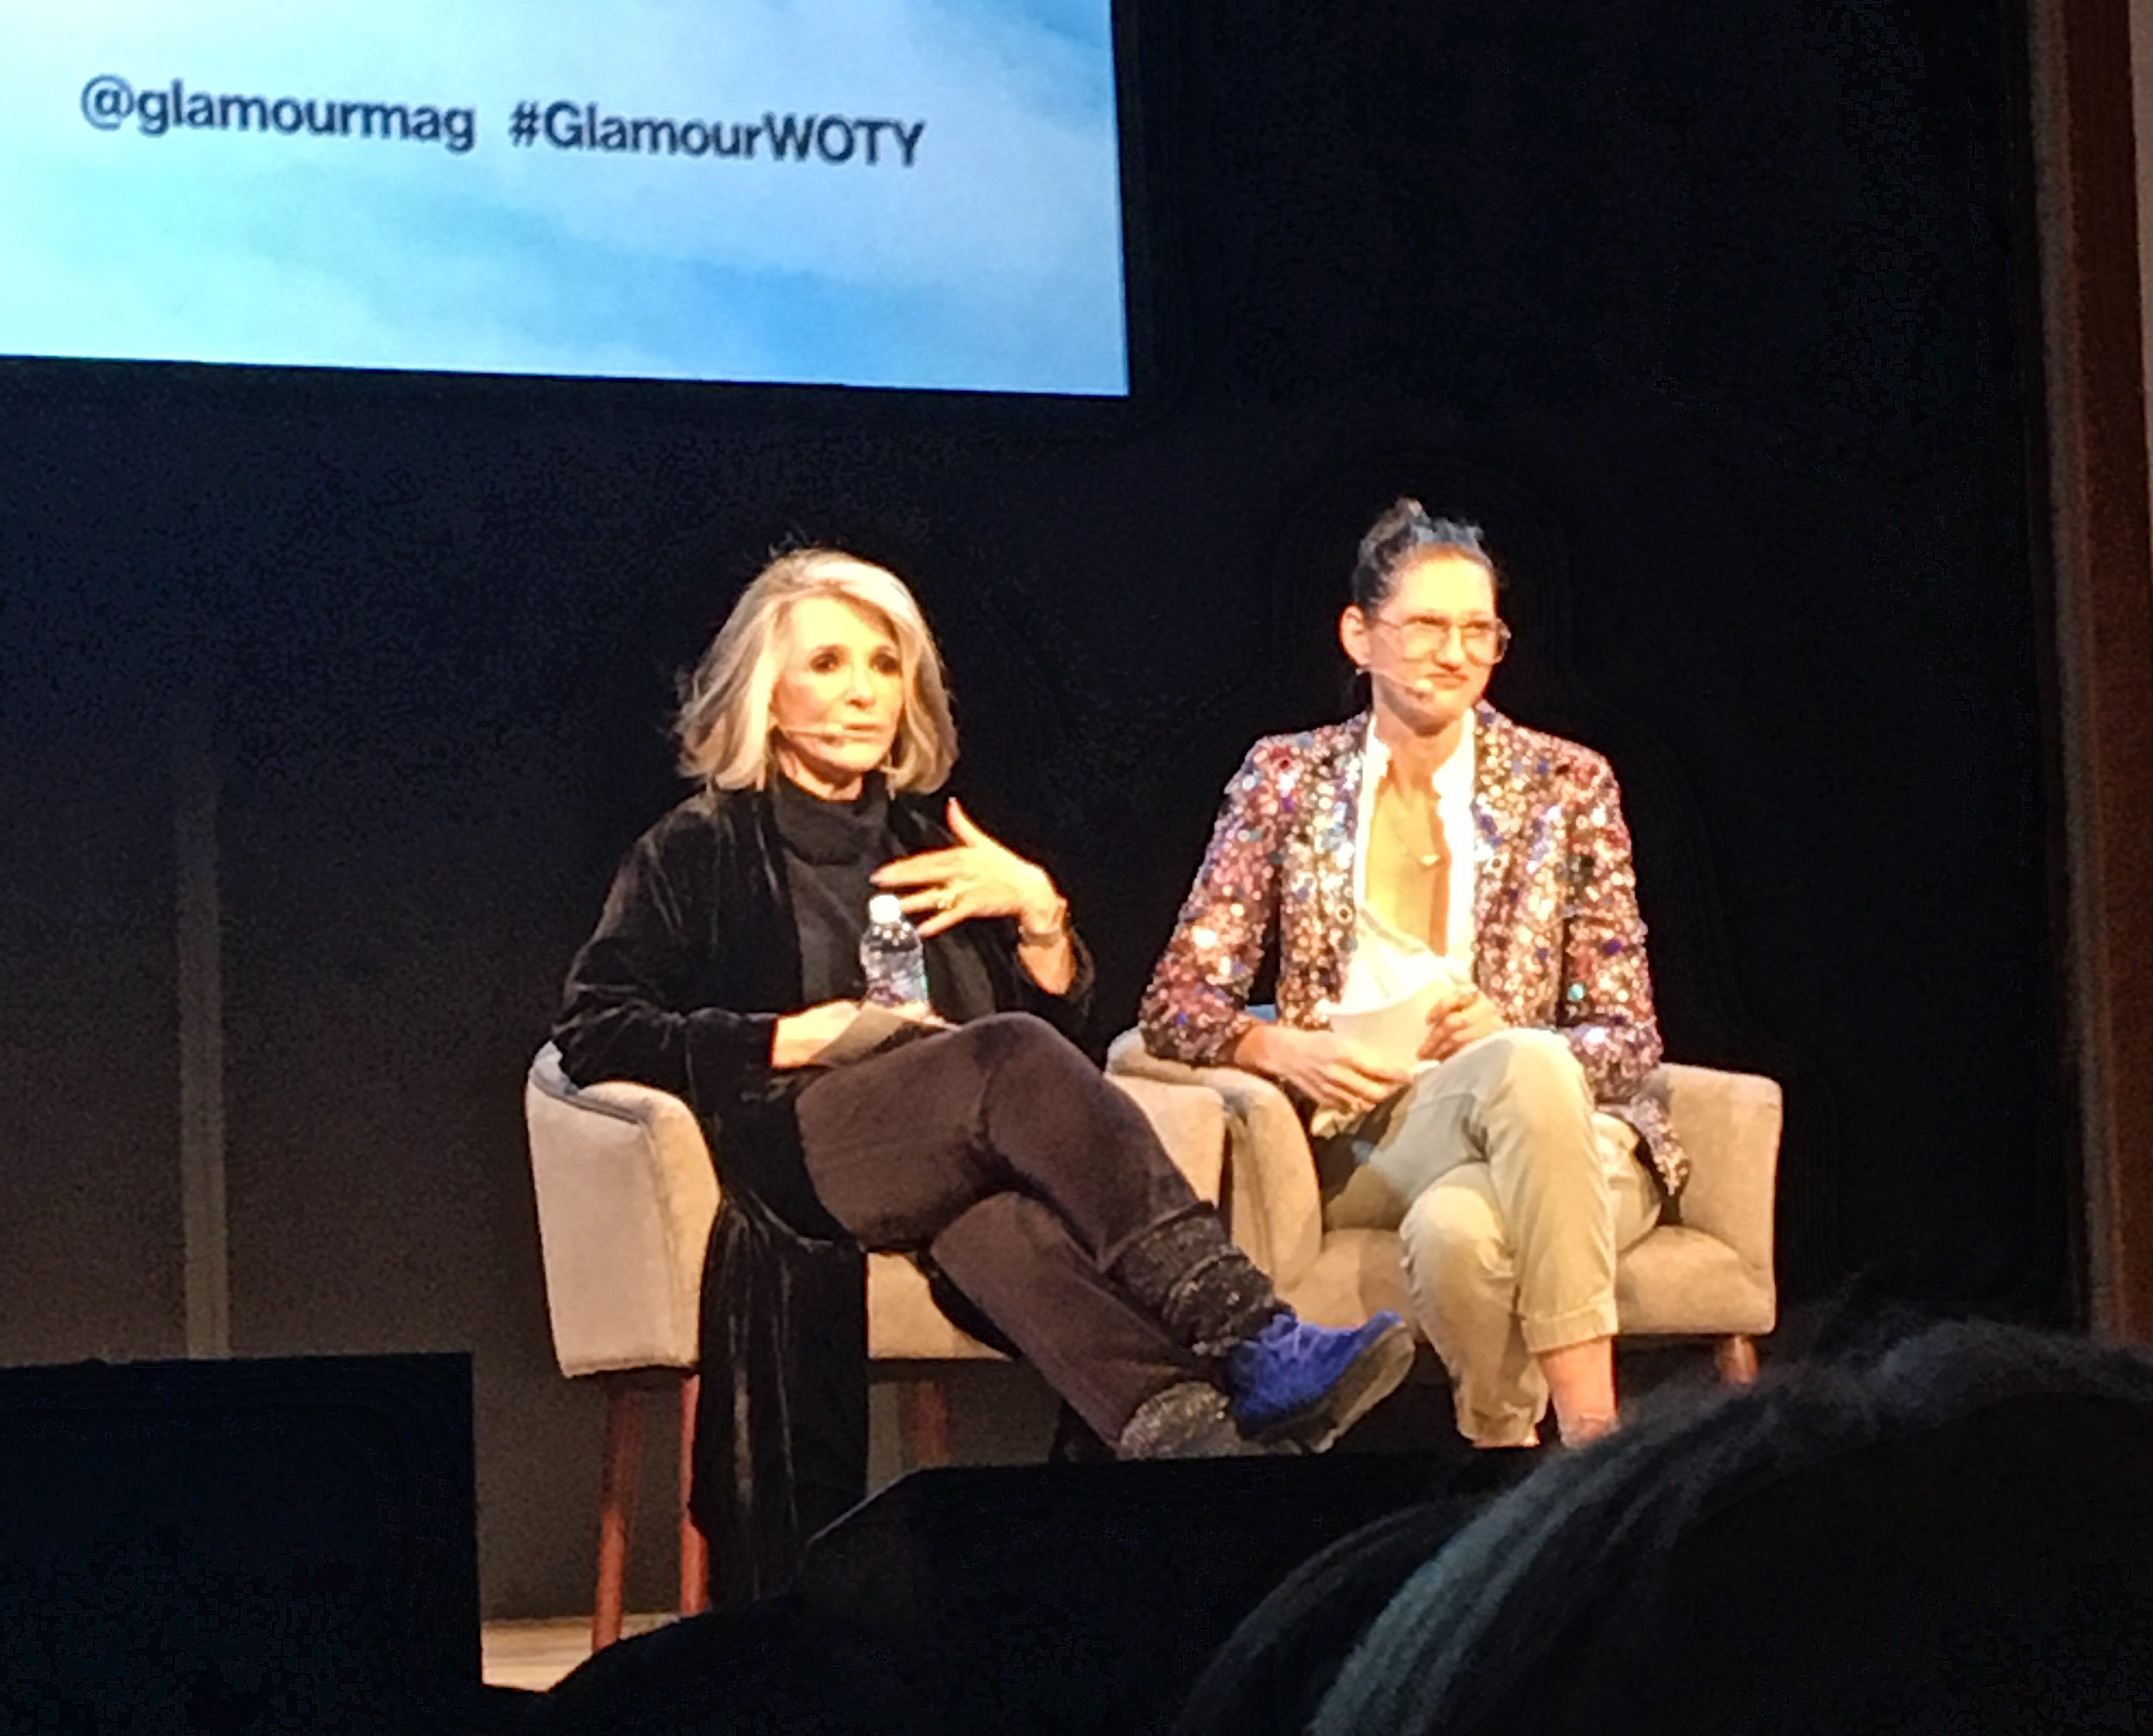 glamour-woty-summit-brooklyn-thankful-inspiration-blogger-new york